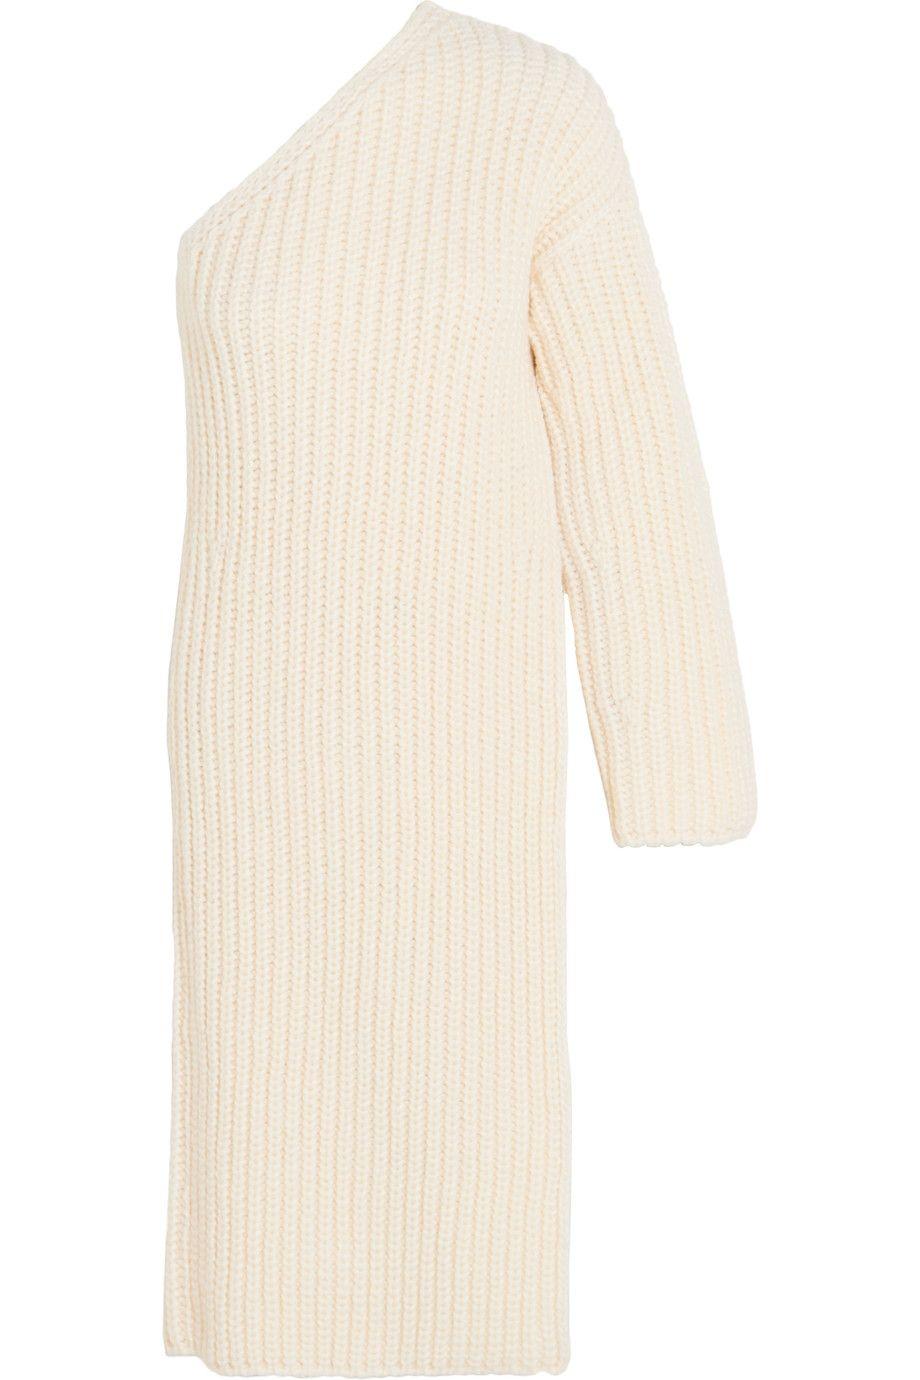 ff2a6a5f490 STELLA MCCARTNEY Asymmetric Ribbed-Knit Wool-Blend Sweater Dress.   stellamccartney  cloth  dress